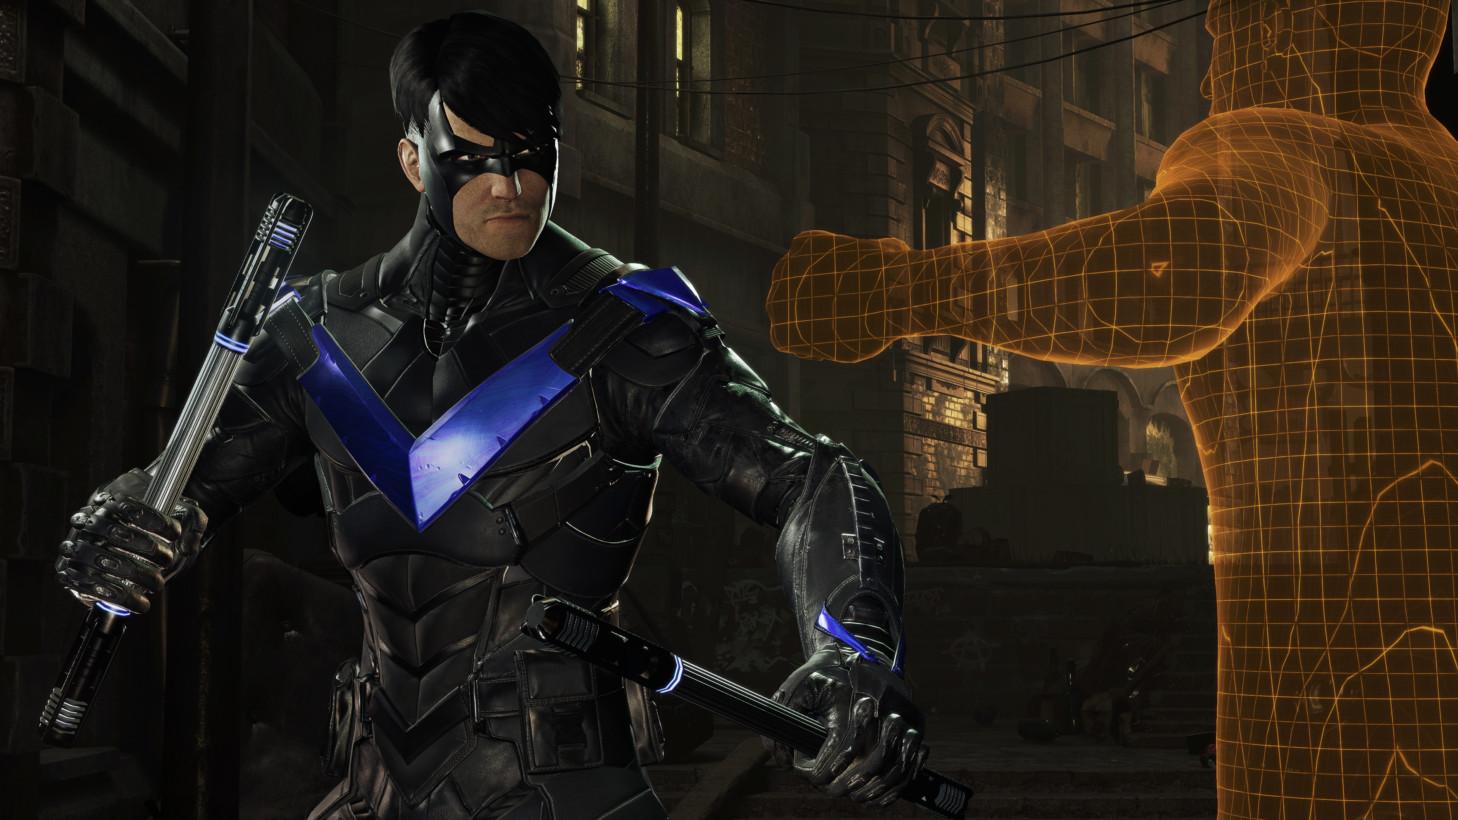 batman_arkham_vr_crime_scene